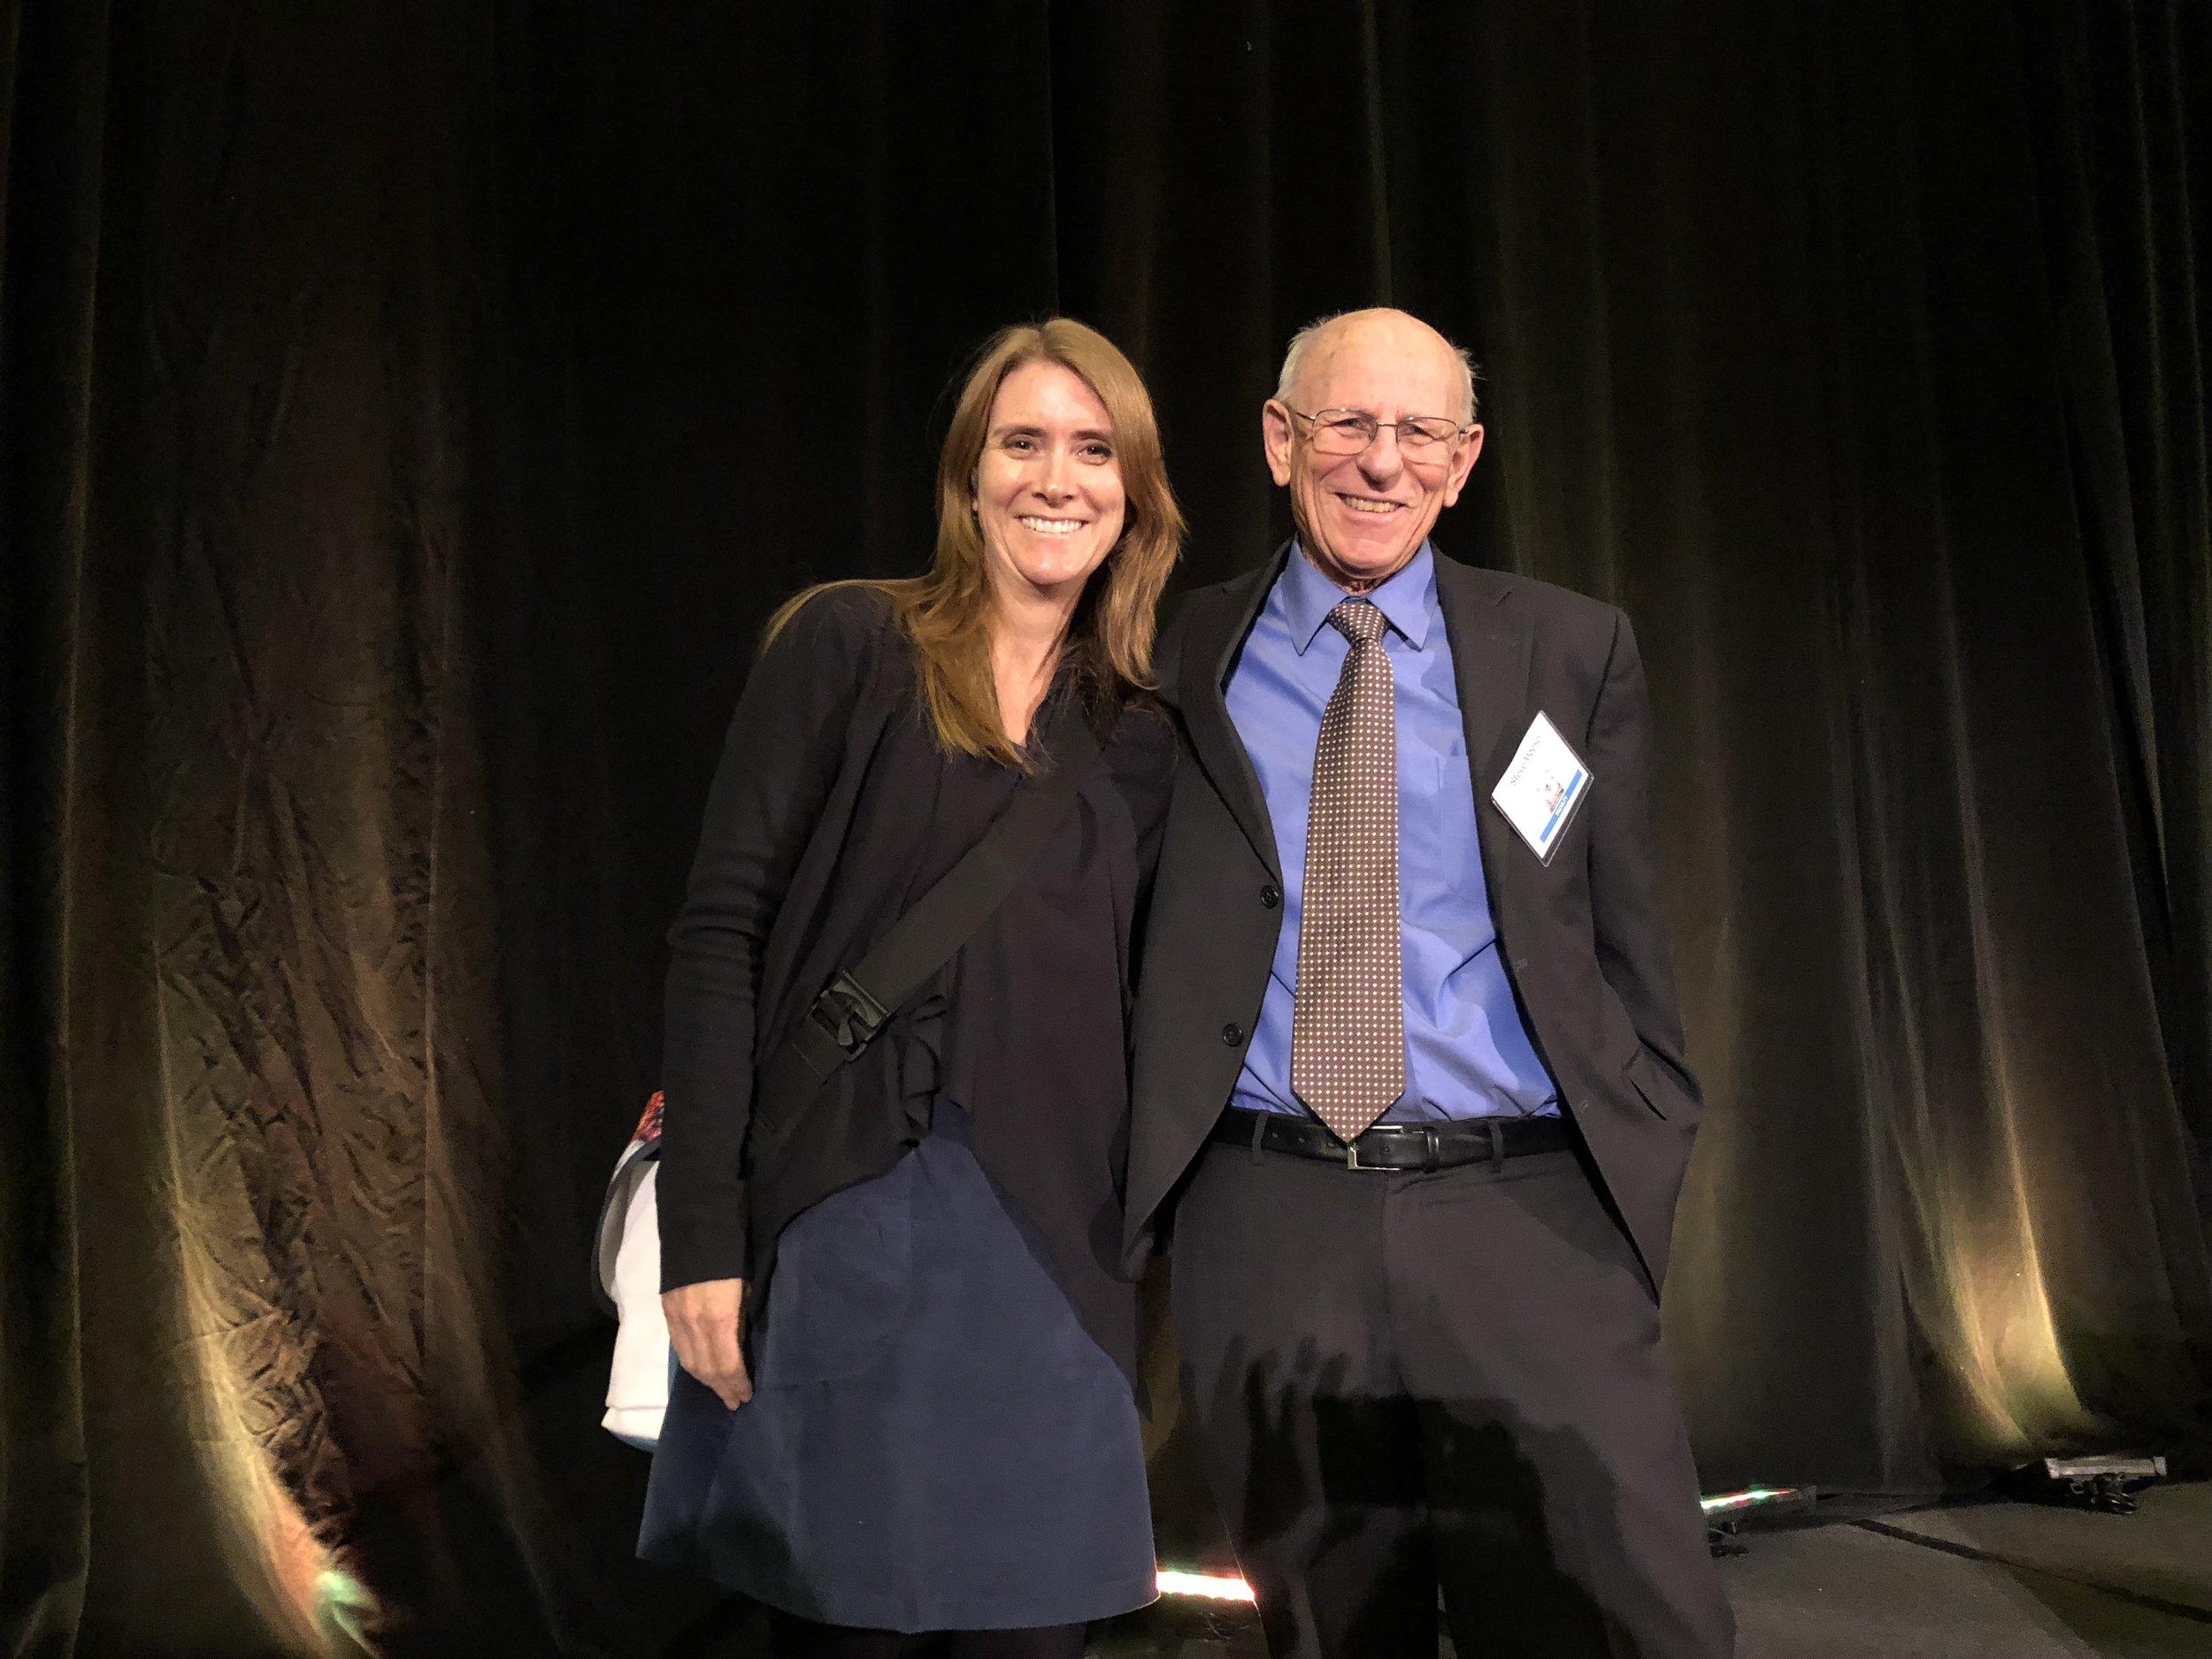 Nicole with SCBWI President Stephen Mooser